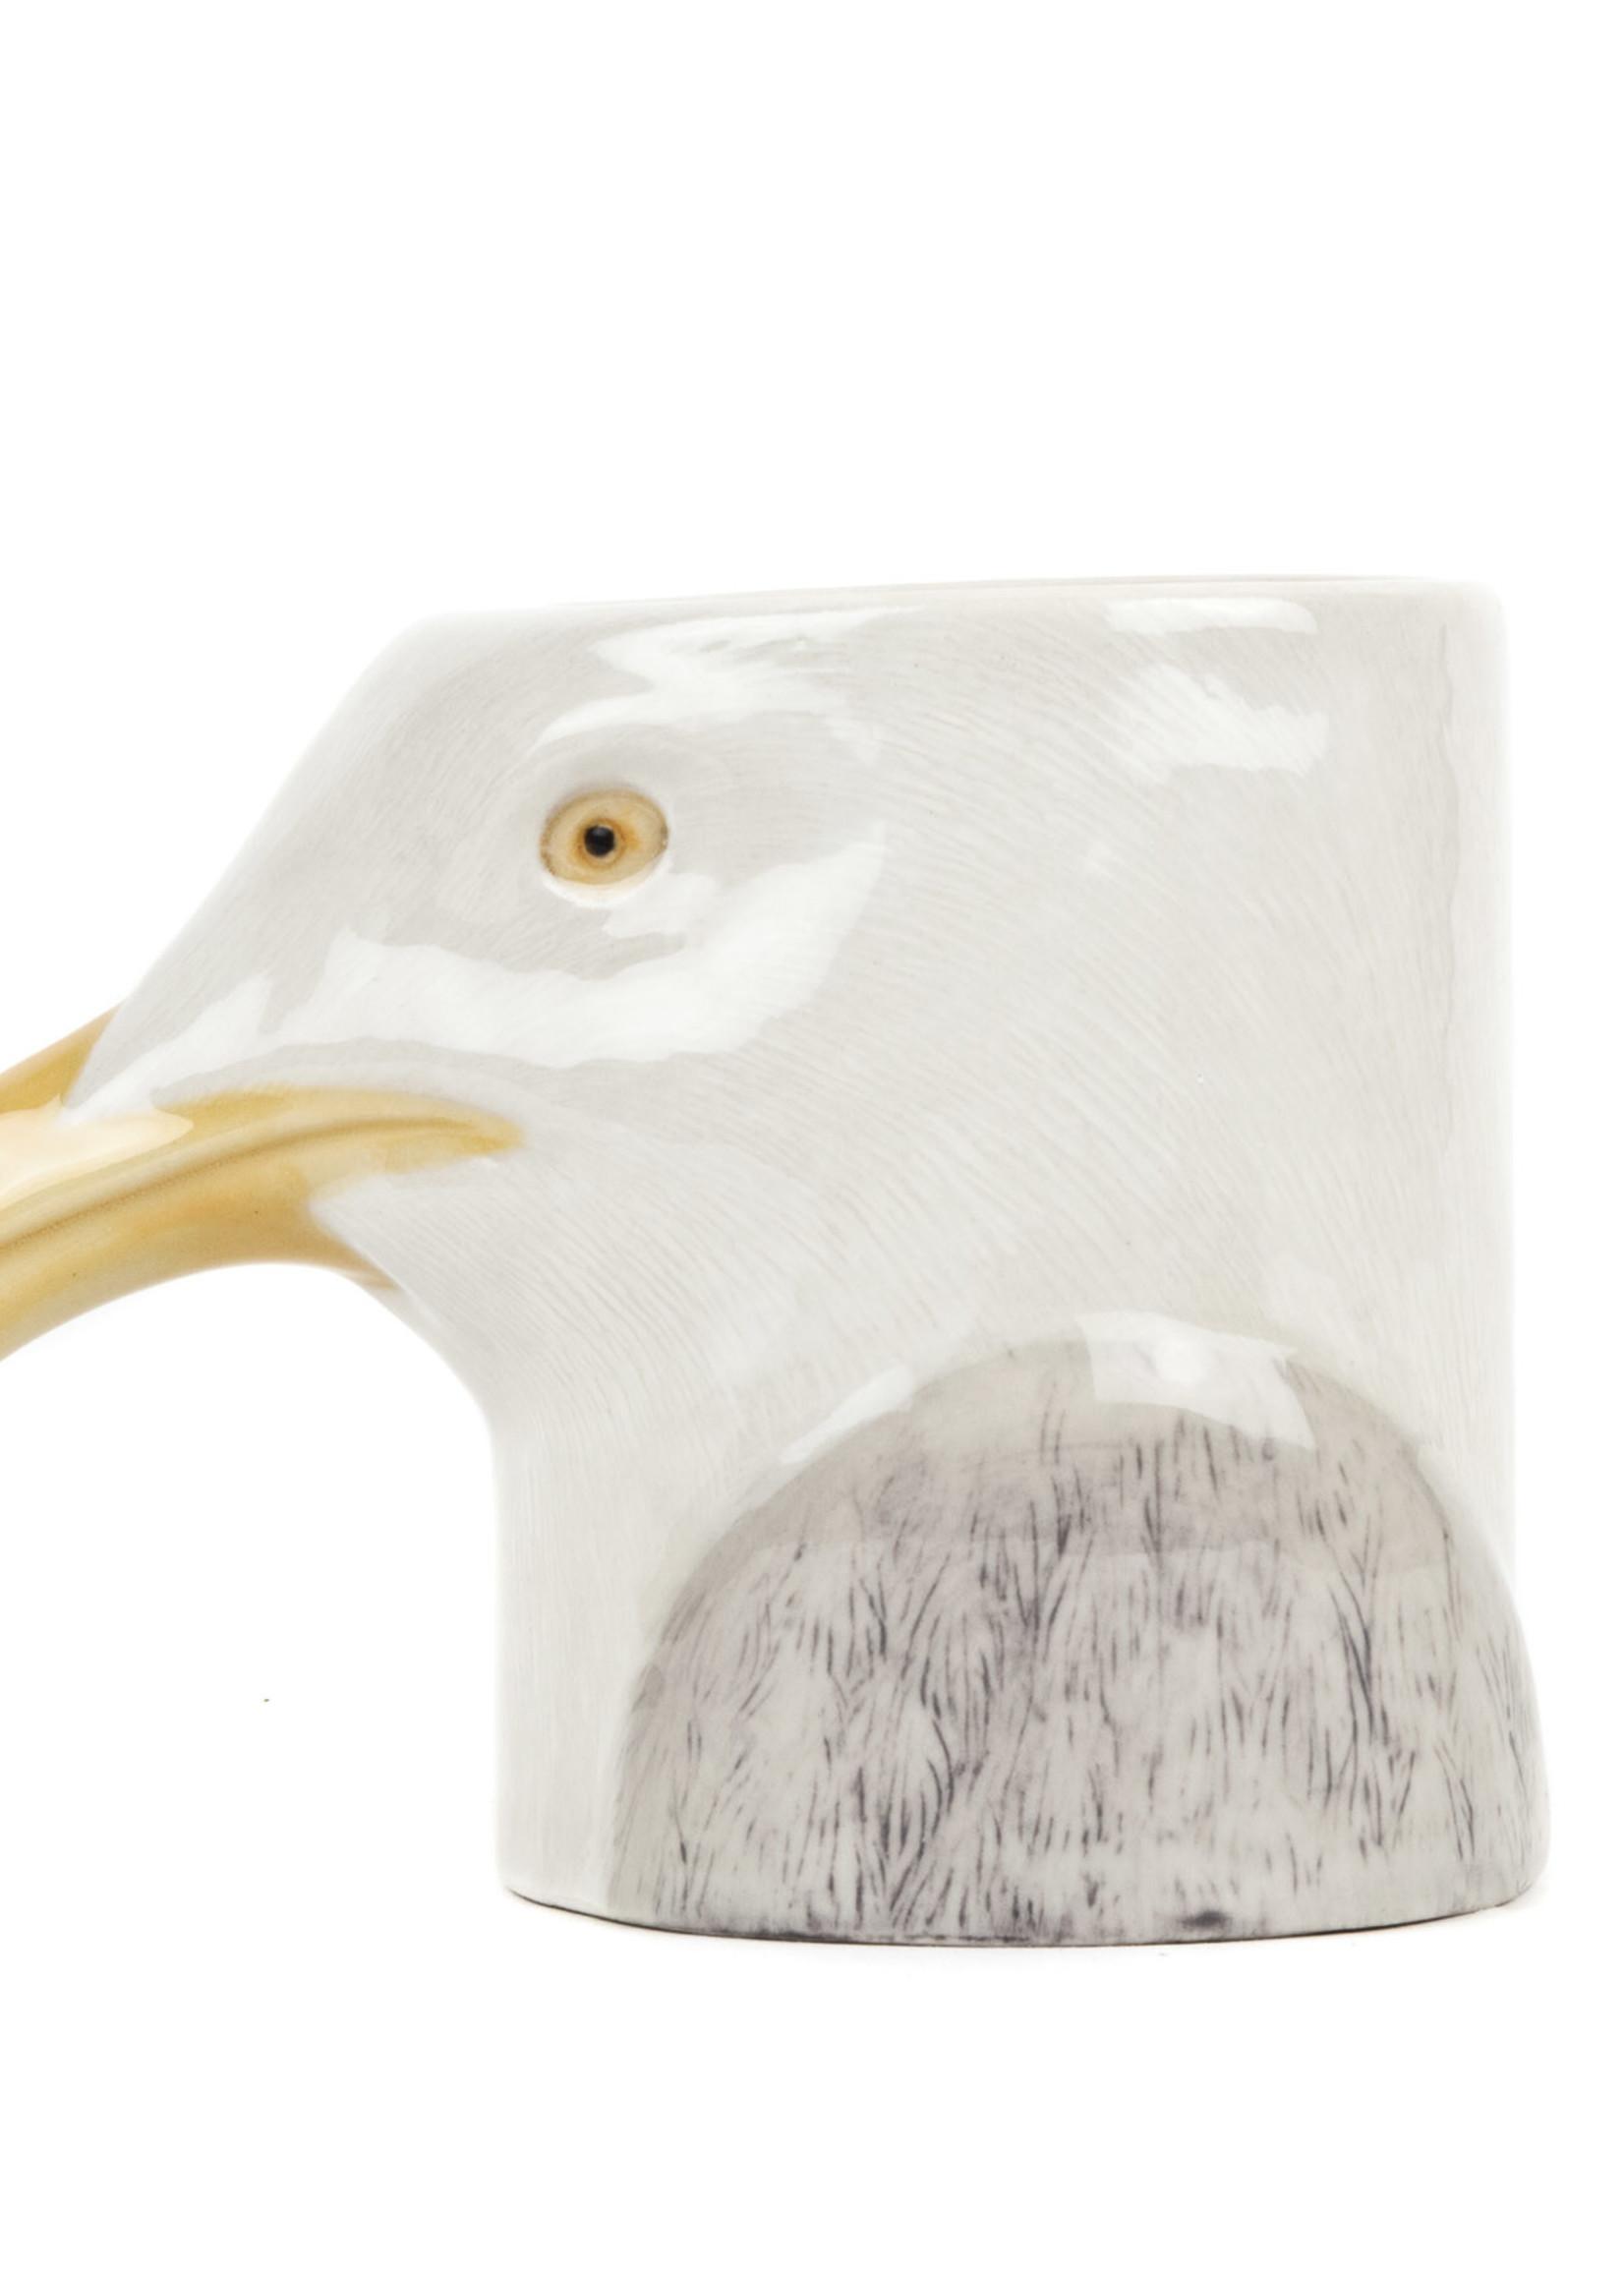 Quail Potje MEEUW herring gull